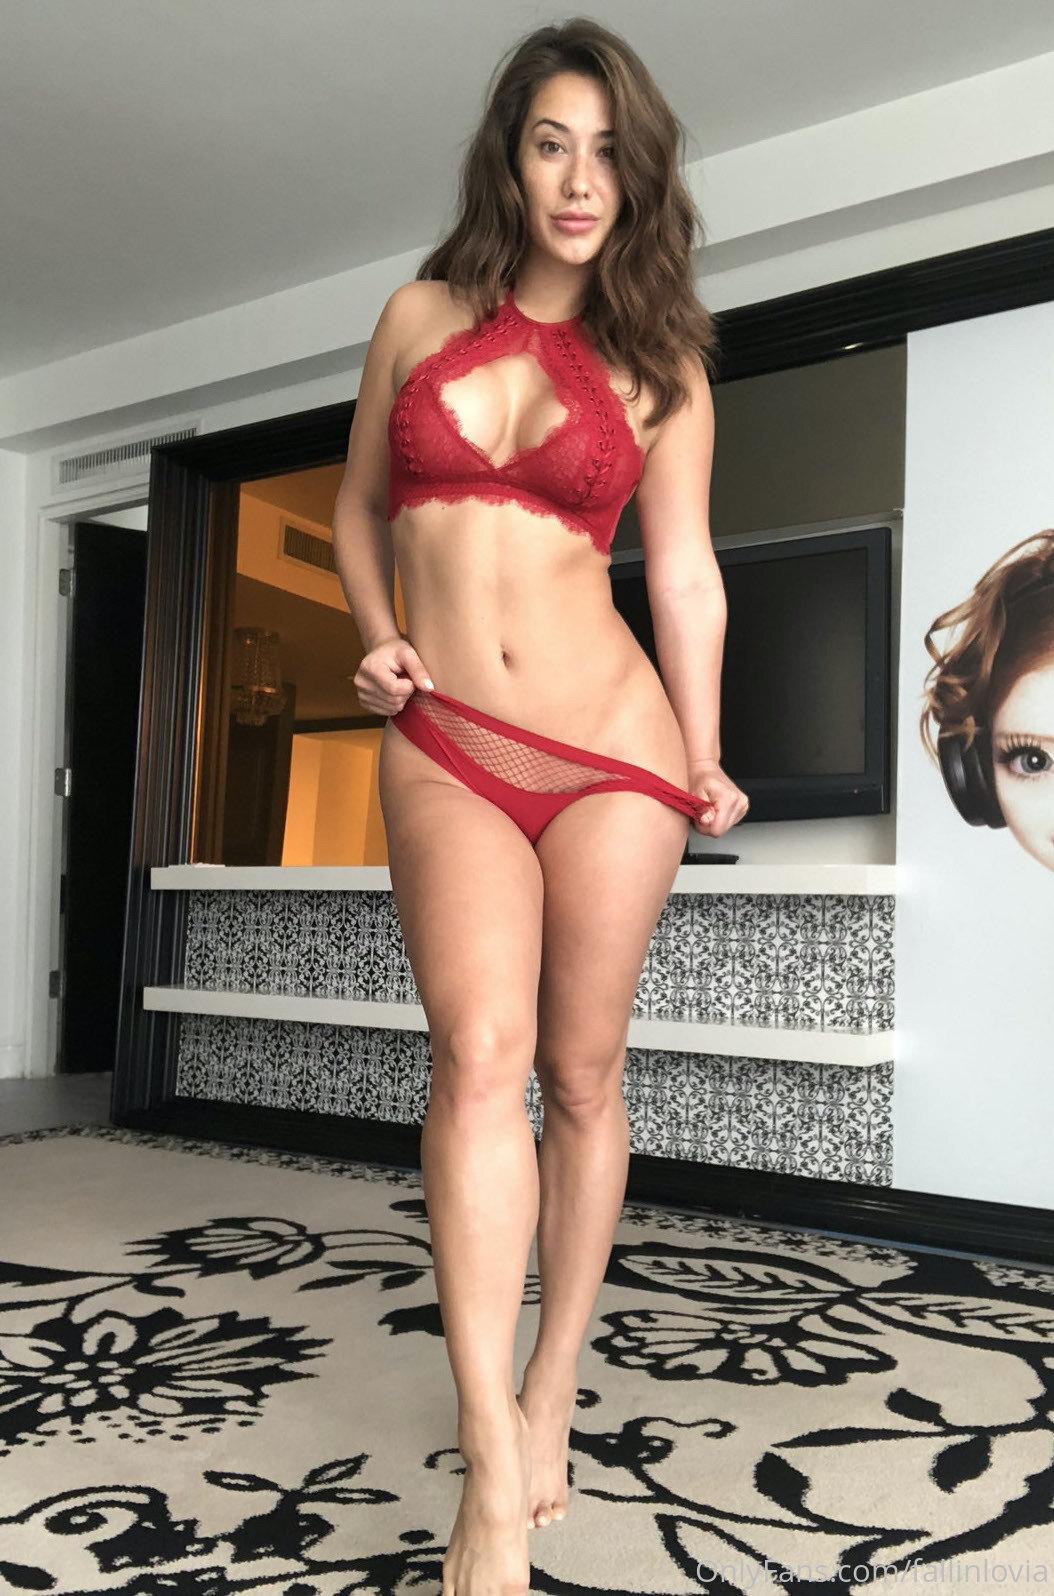 Eva Lovia, Fallinlovia, Onlyfans 0114